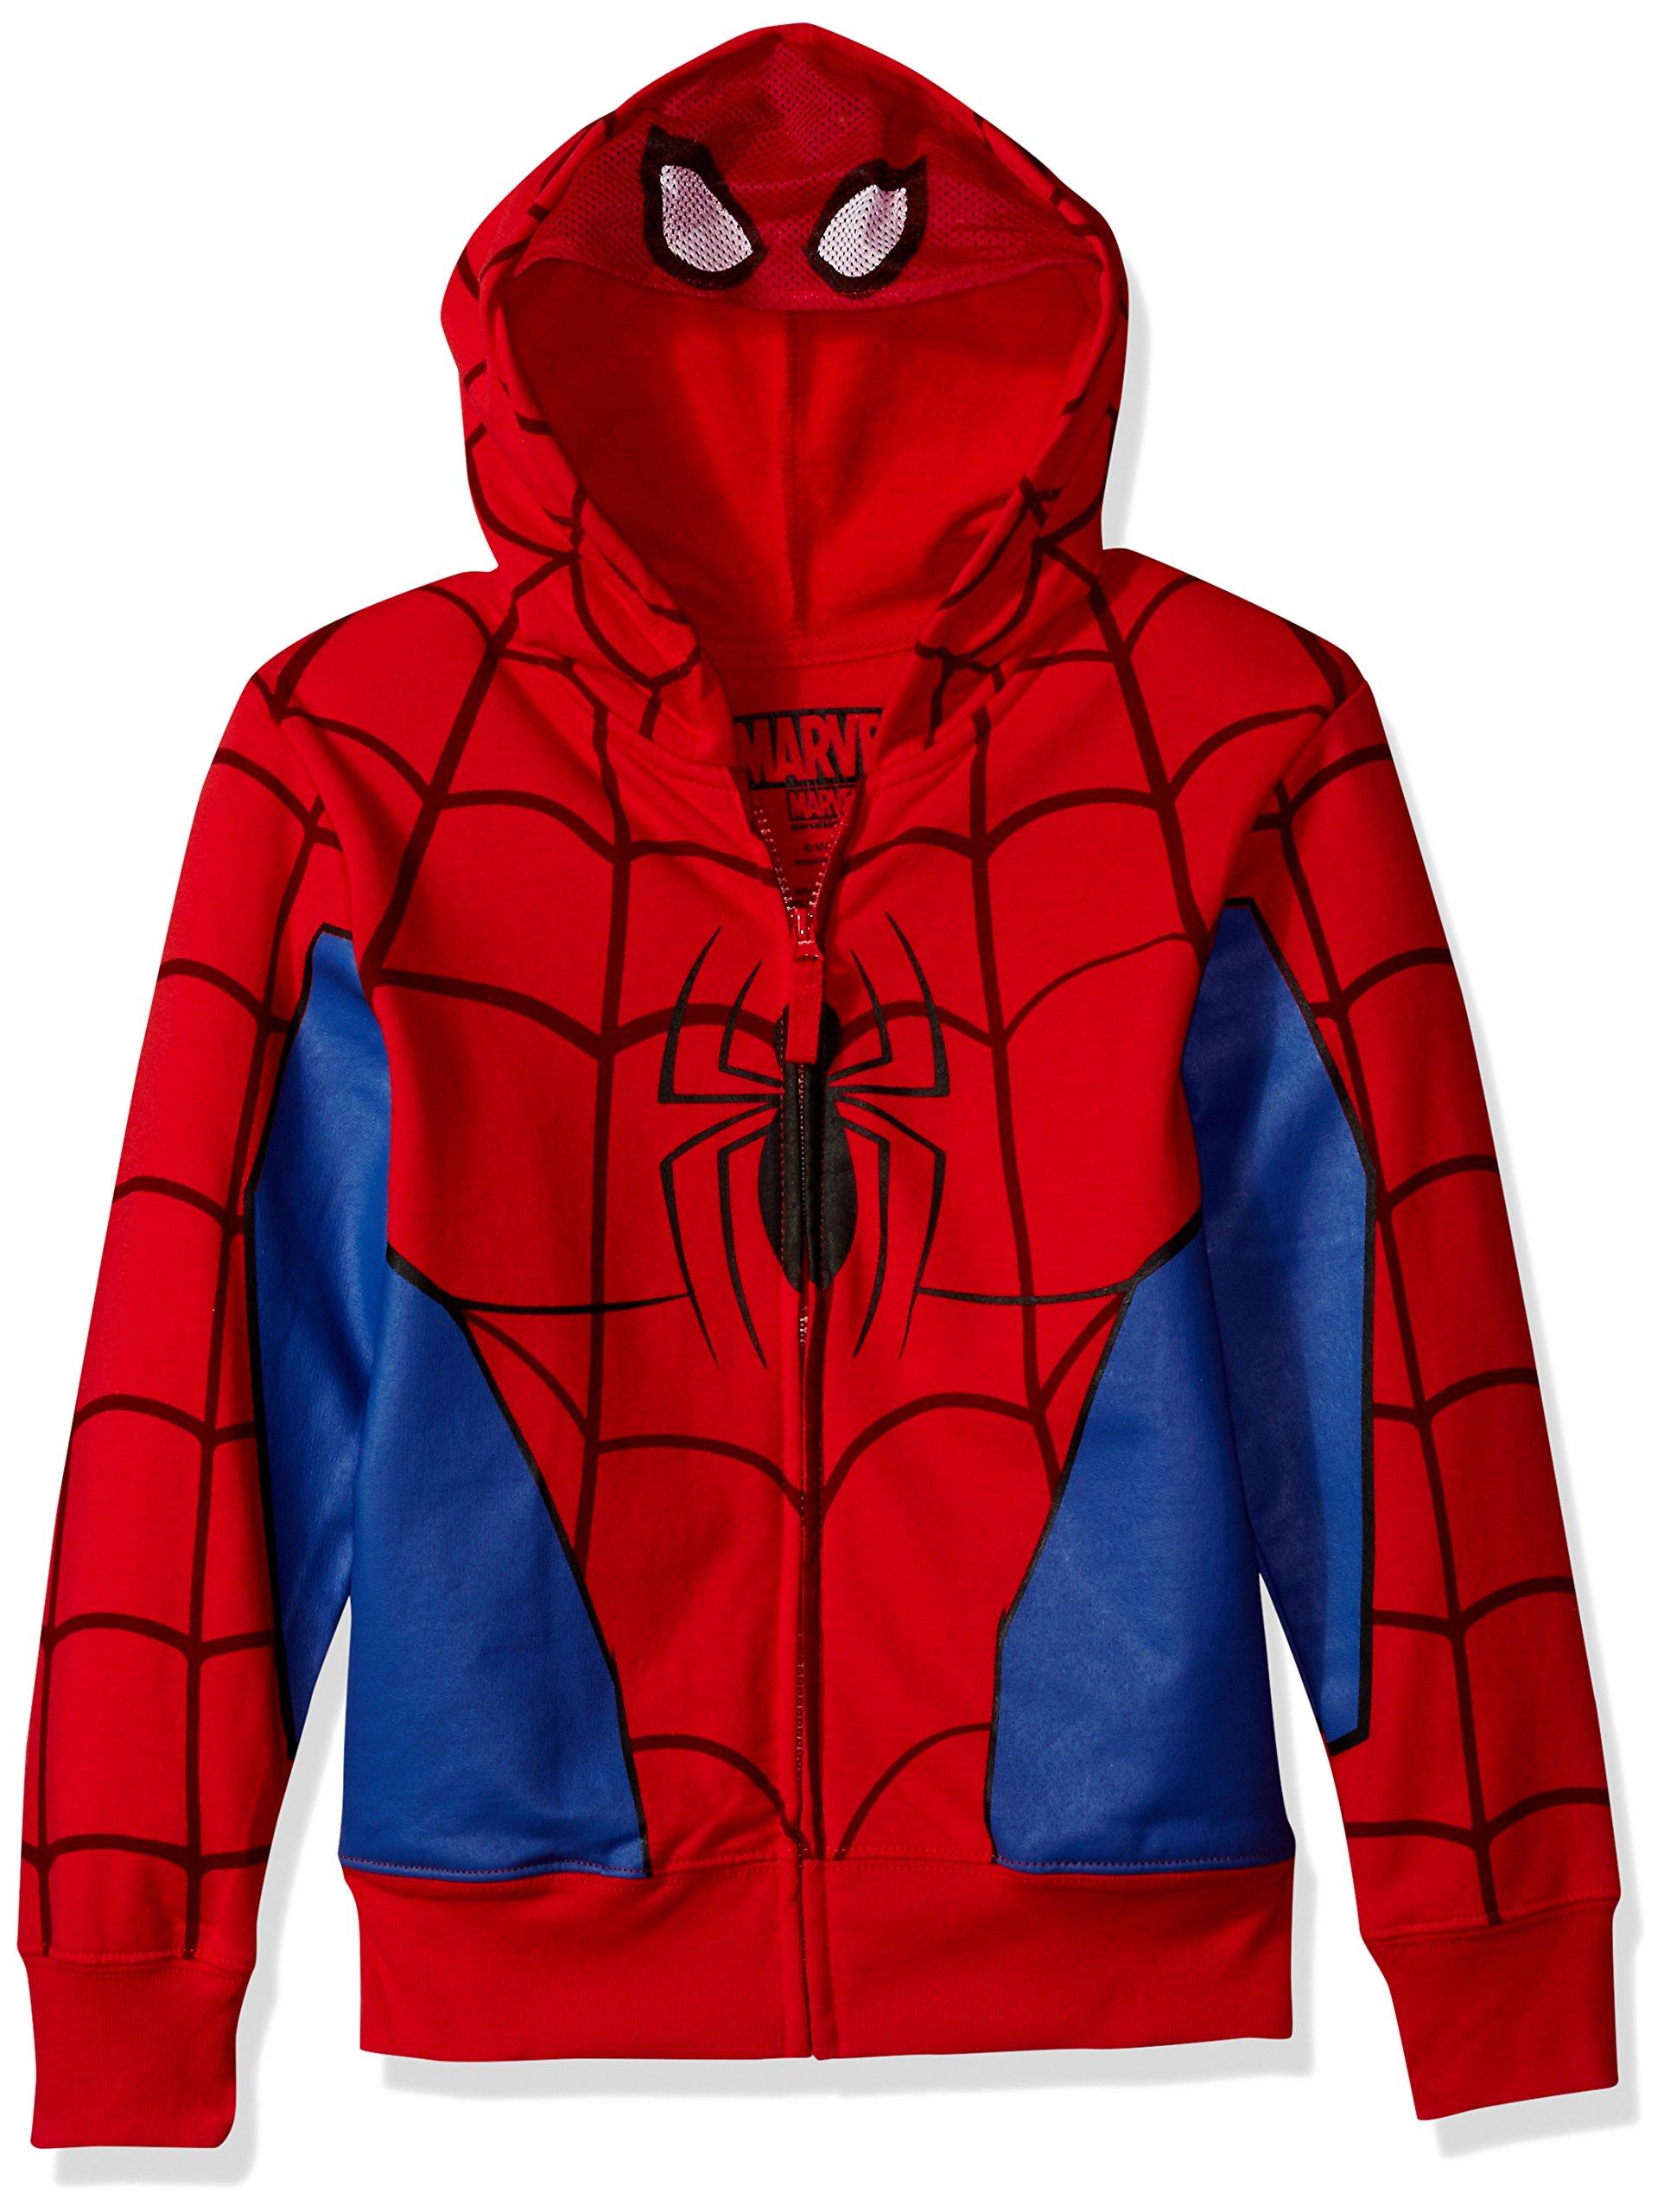 Marvel Little Boys' Spiderman Mask Costume Hoodie, Red, M-5/6